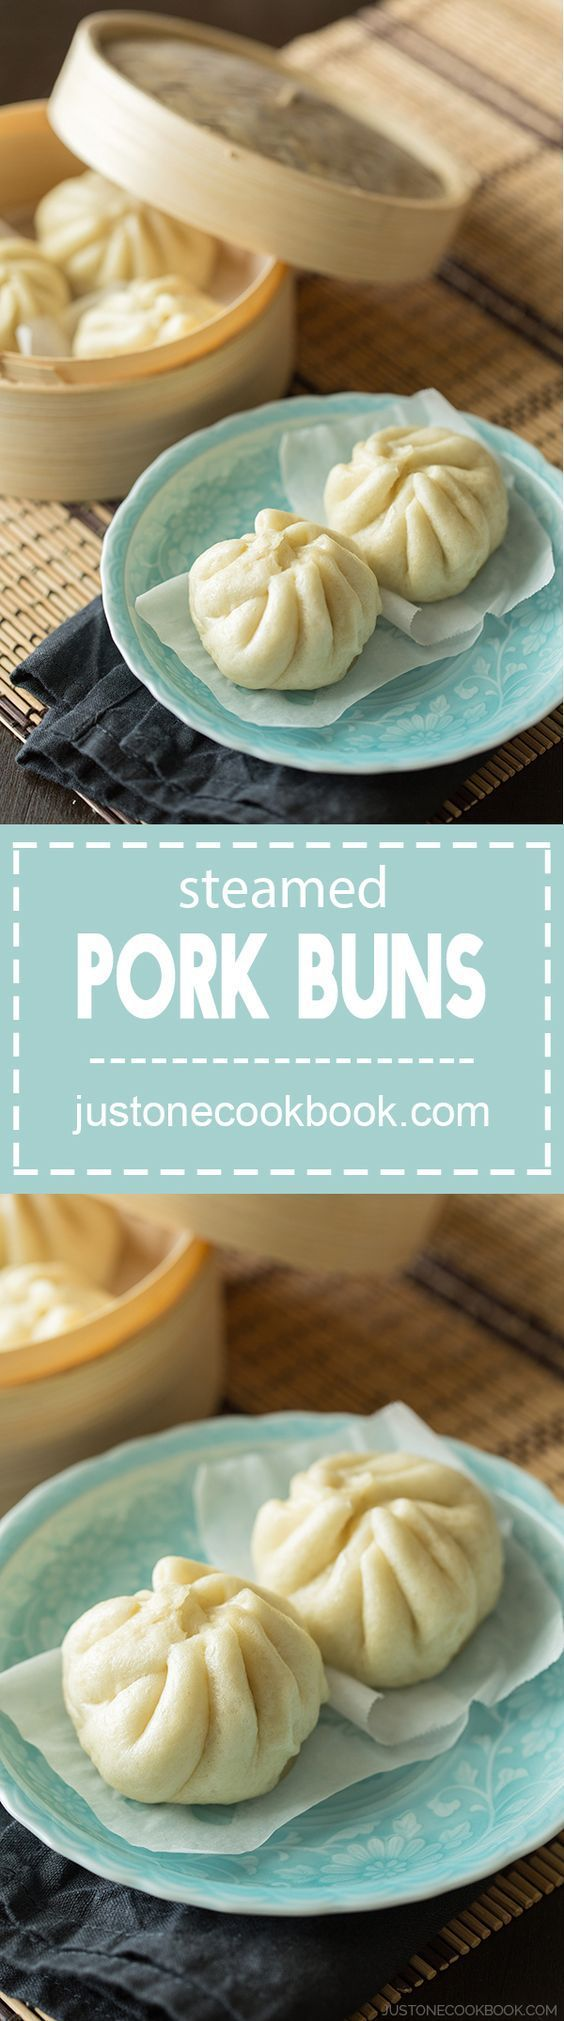 208 best Dim sum/Dumplings images on Pinterest | Chinese food ...